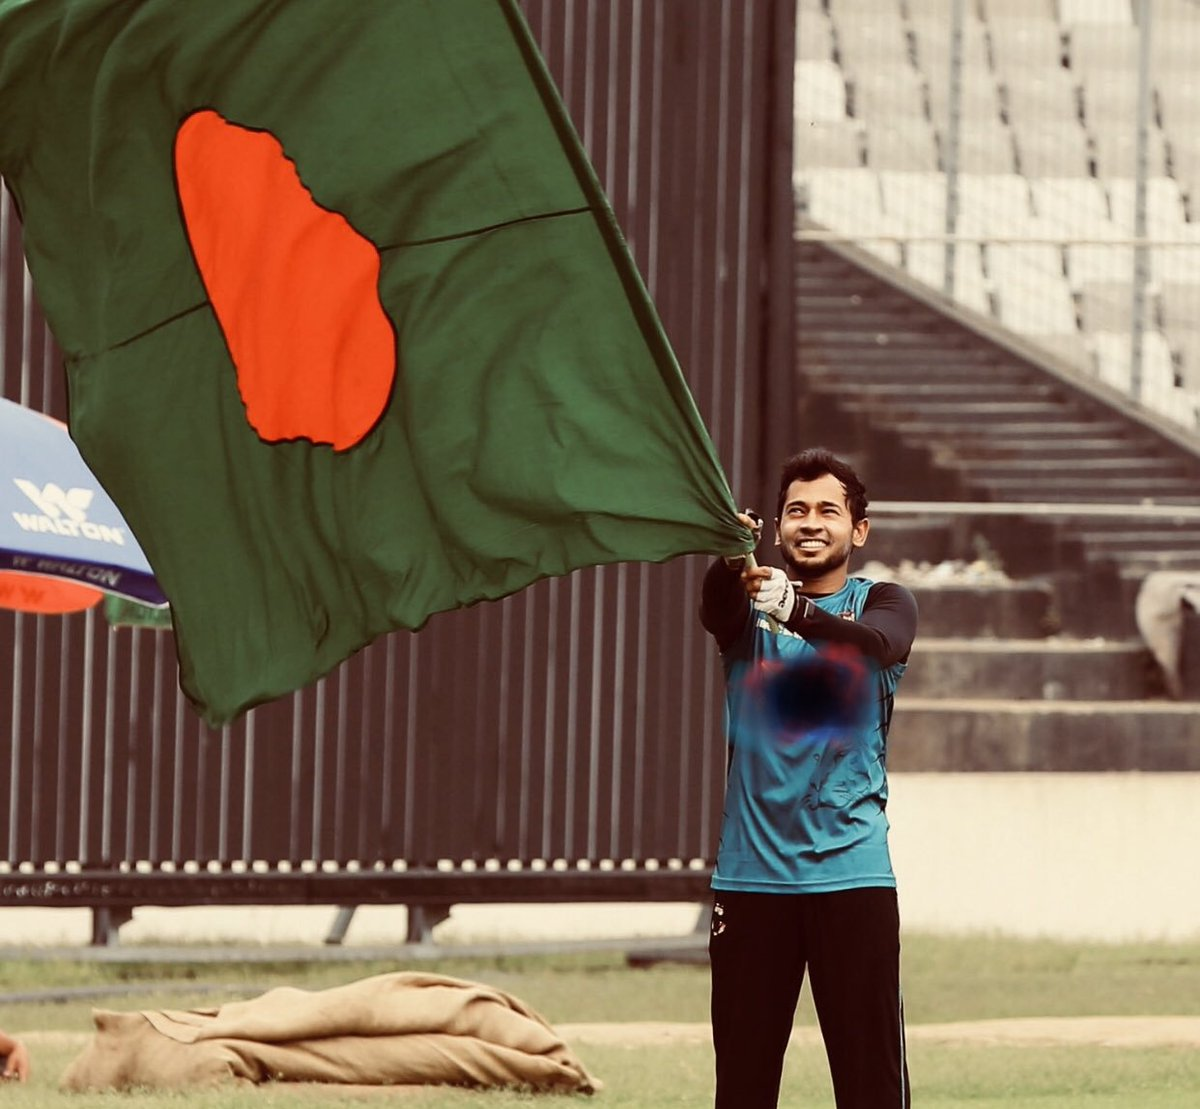 Famous Naagin Dancer Mushfiqur Rahim is not coming Pakistan for T20i Series  <br>http://pic.twitter.com/Pk5auMlAUJ